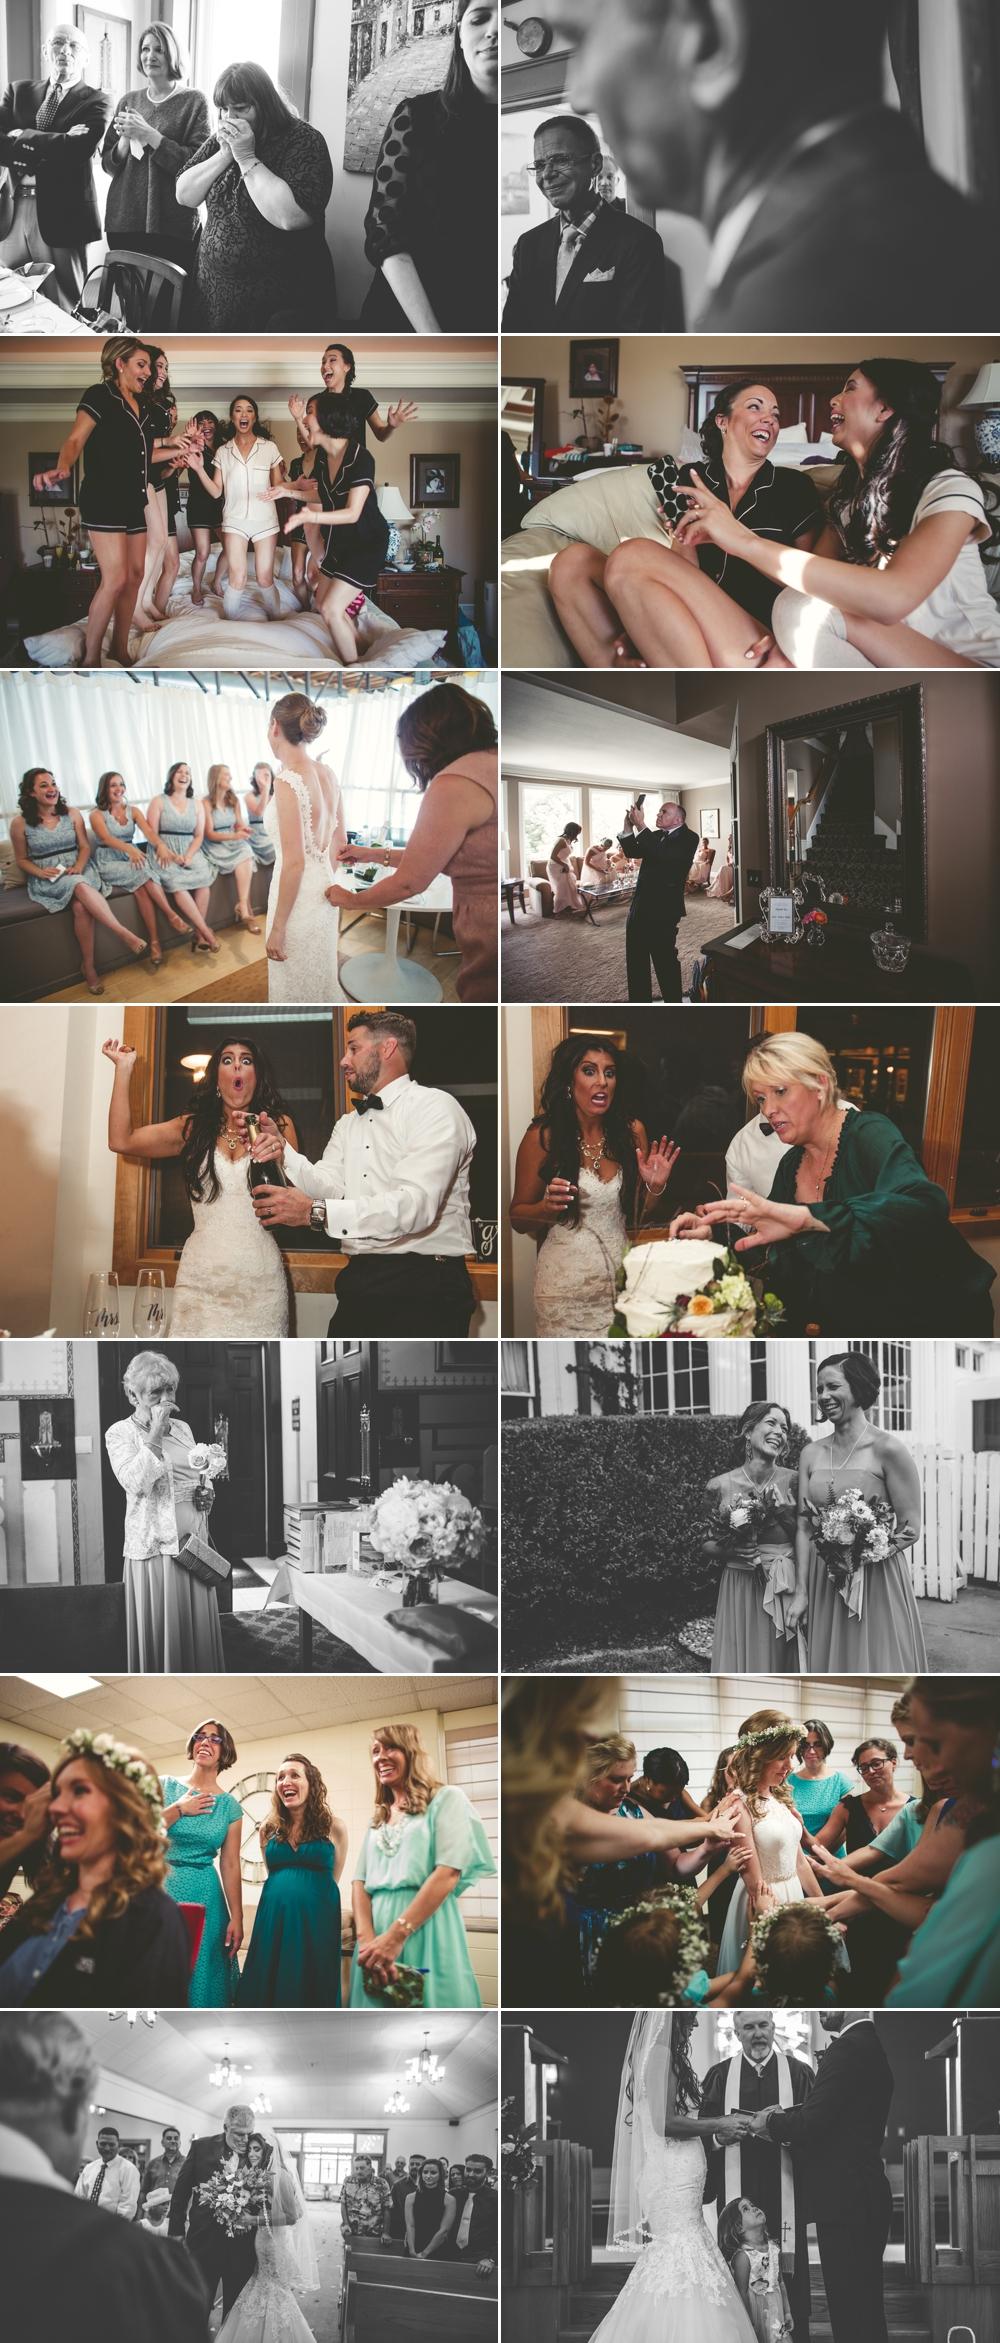 jason_domingues_photography_best_kansas_city_photography_kc_wedding_weddings0003.jpg